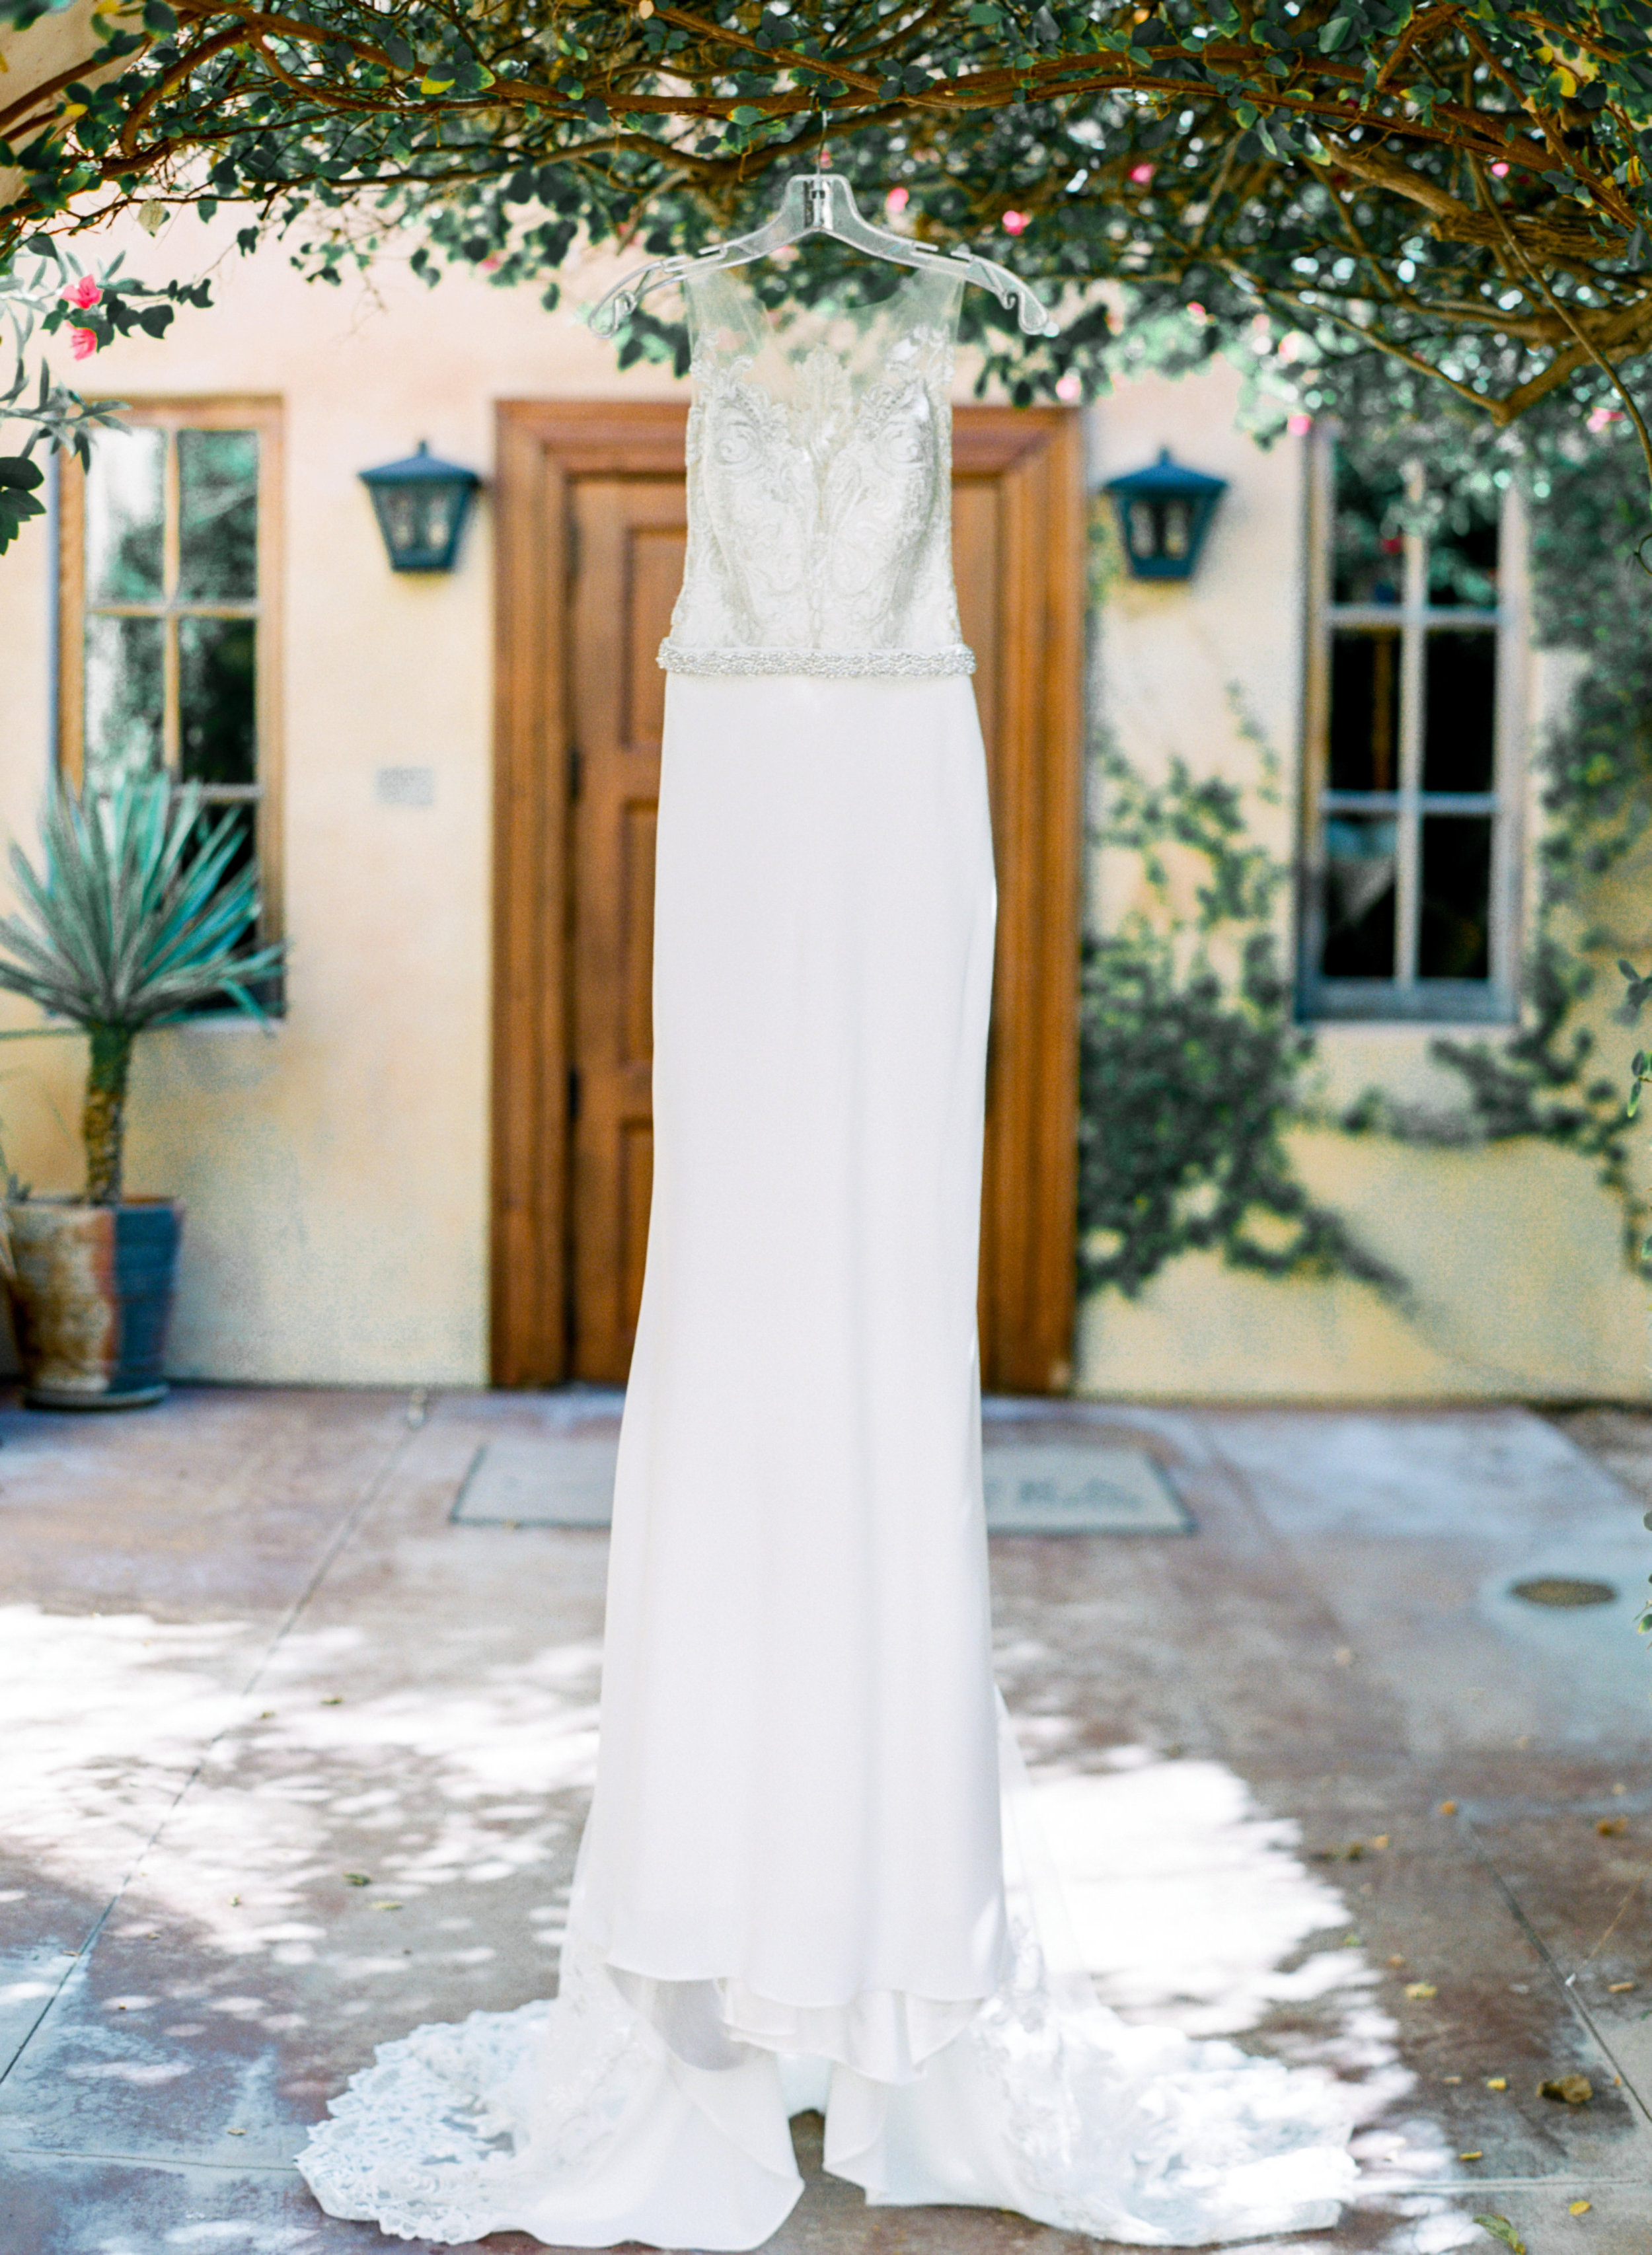 Nick and Erica Wedding at El Chorro-02-2.jpg